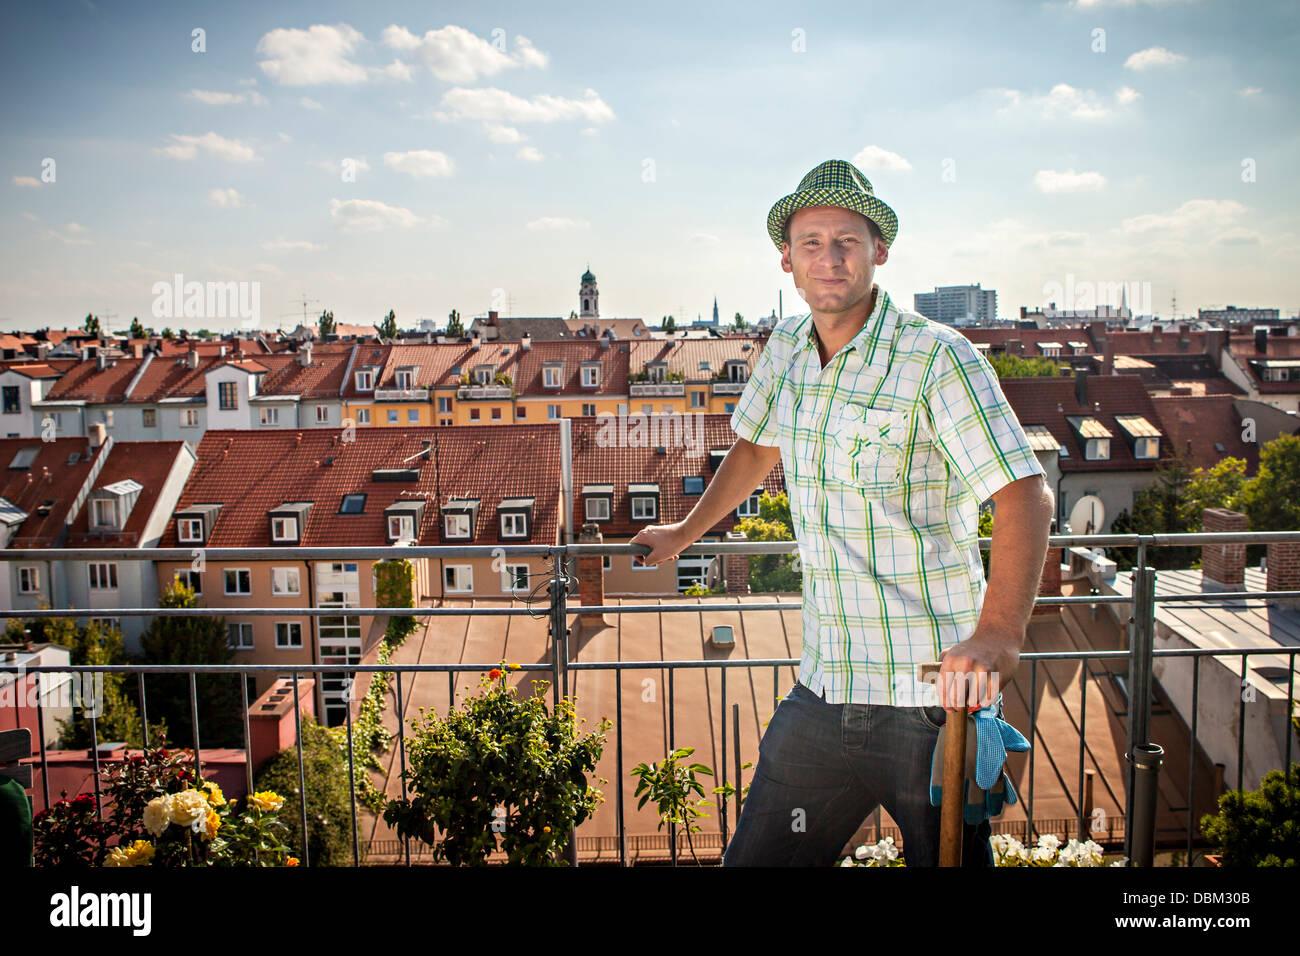 Man Standing On Balcony, Munich, Bavaria, Germany, Europe - Stock Image